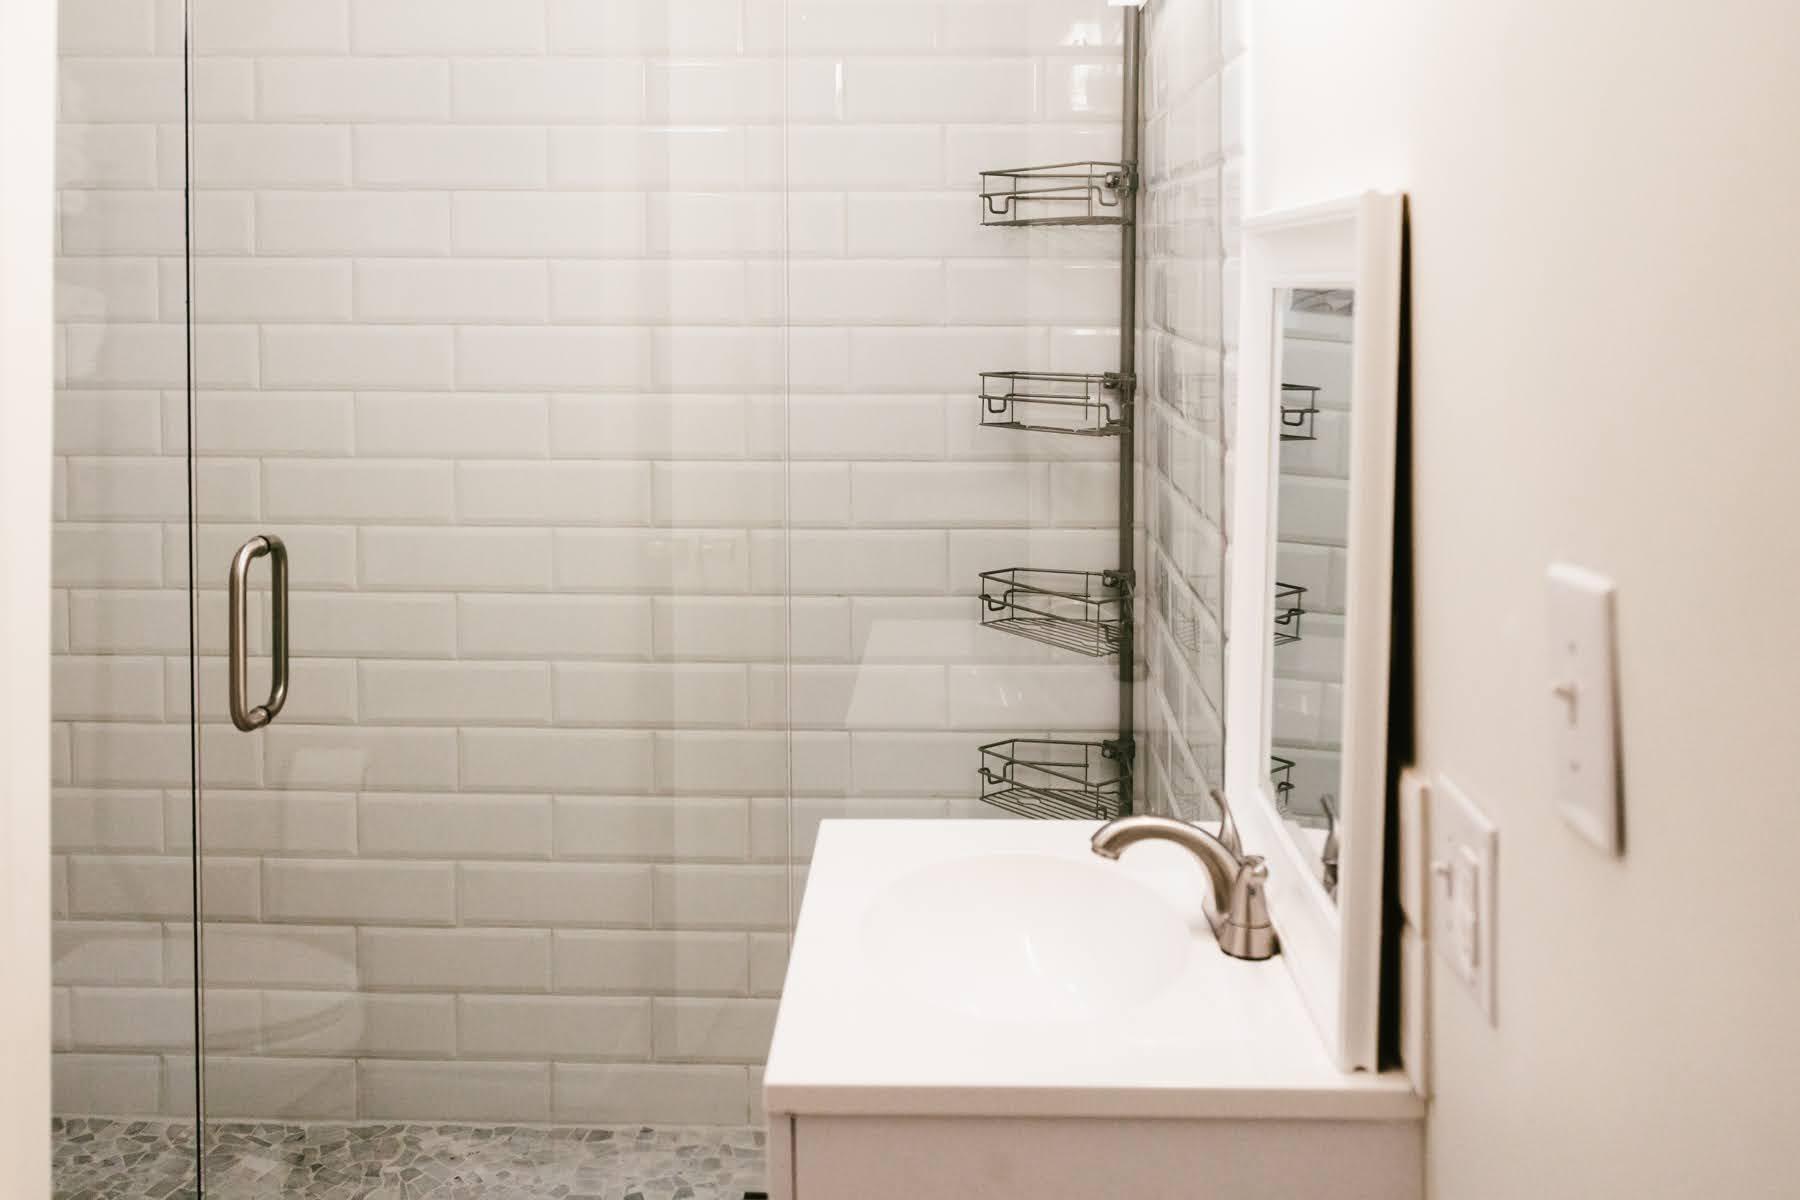 Bathroom 1: Brand new